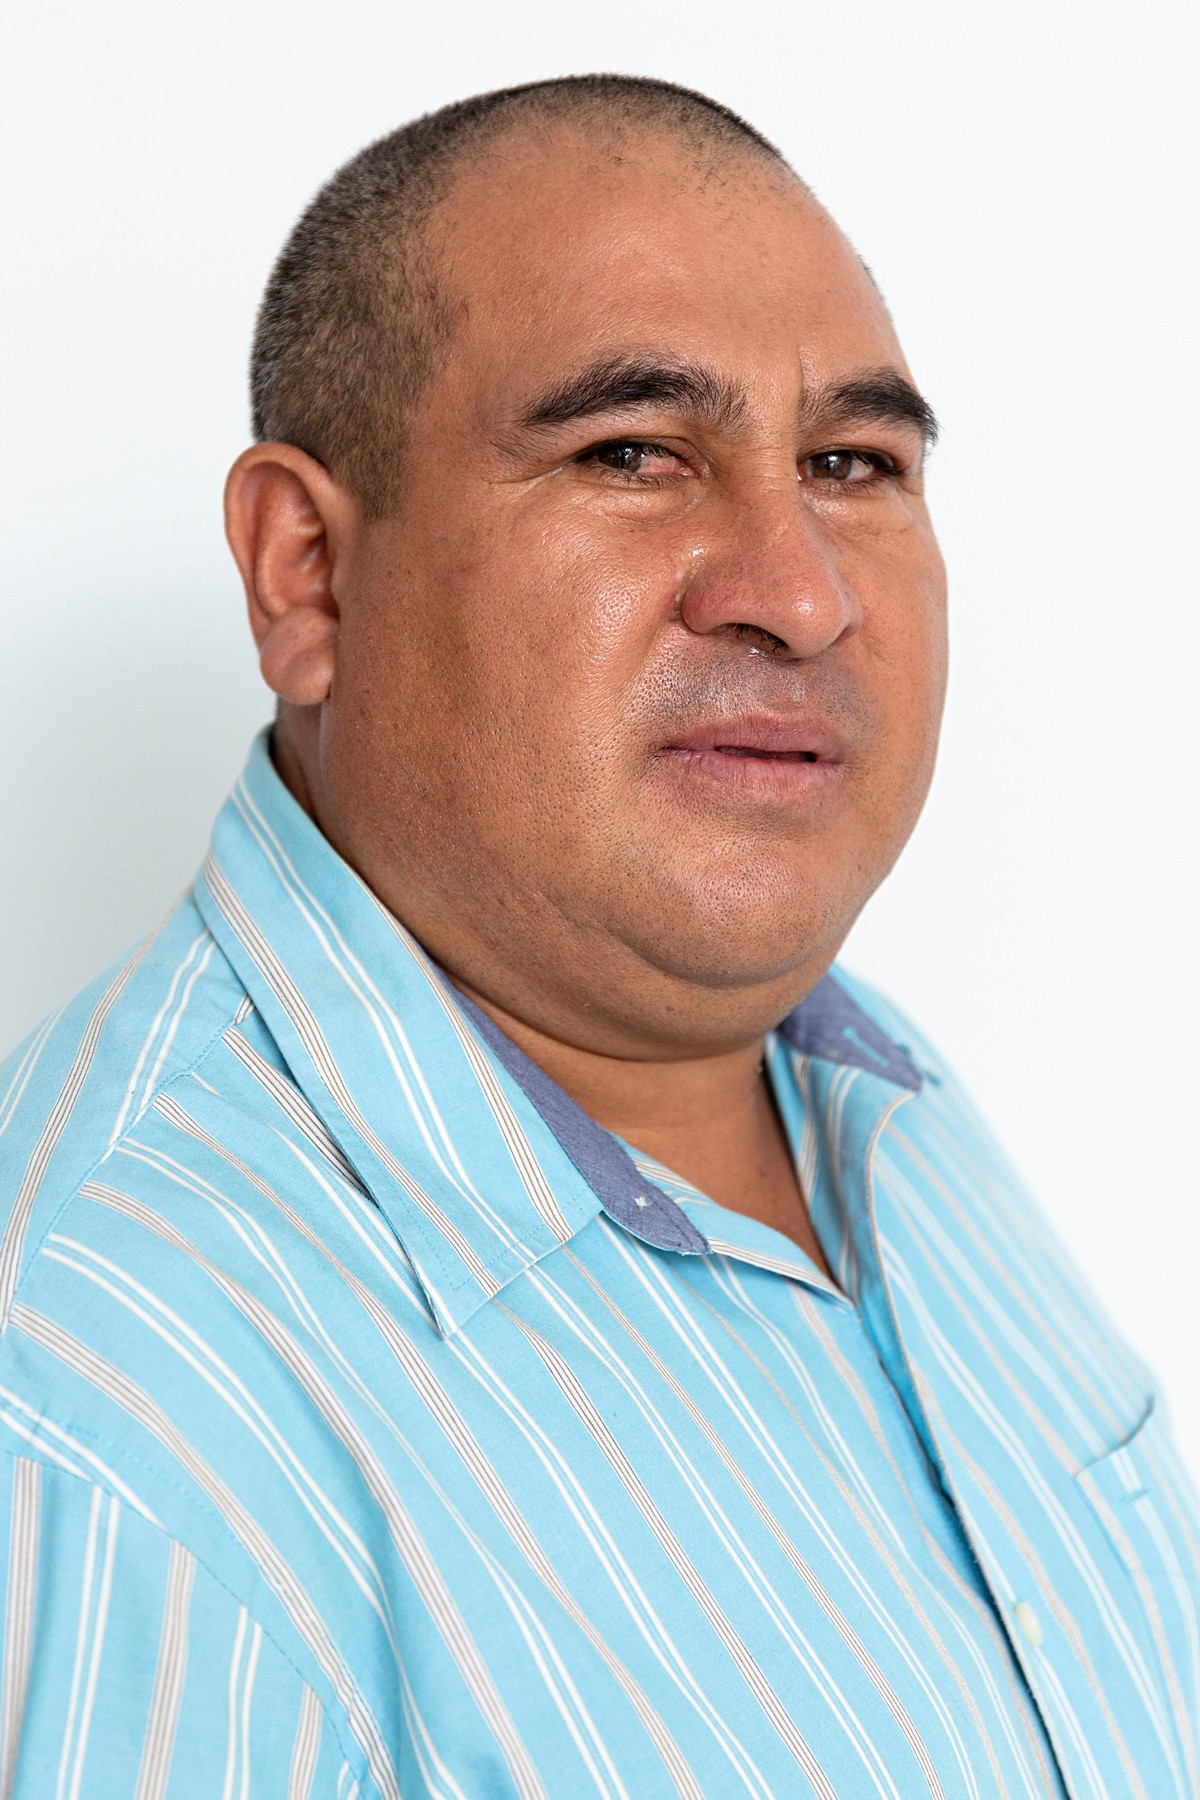 Isidro Guerrero